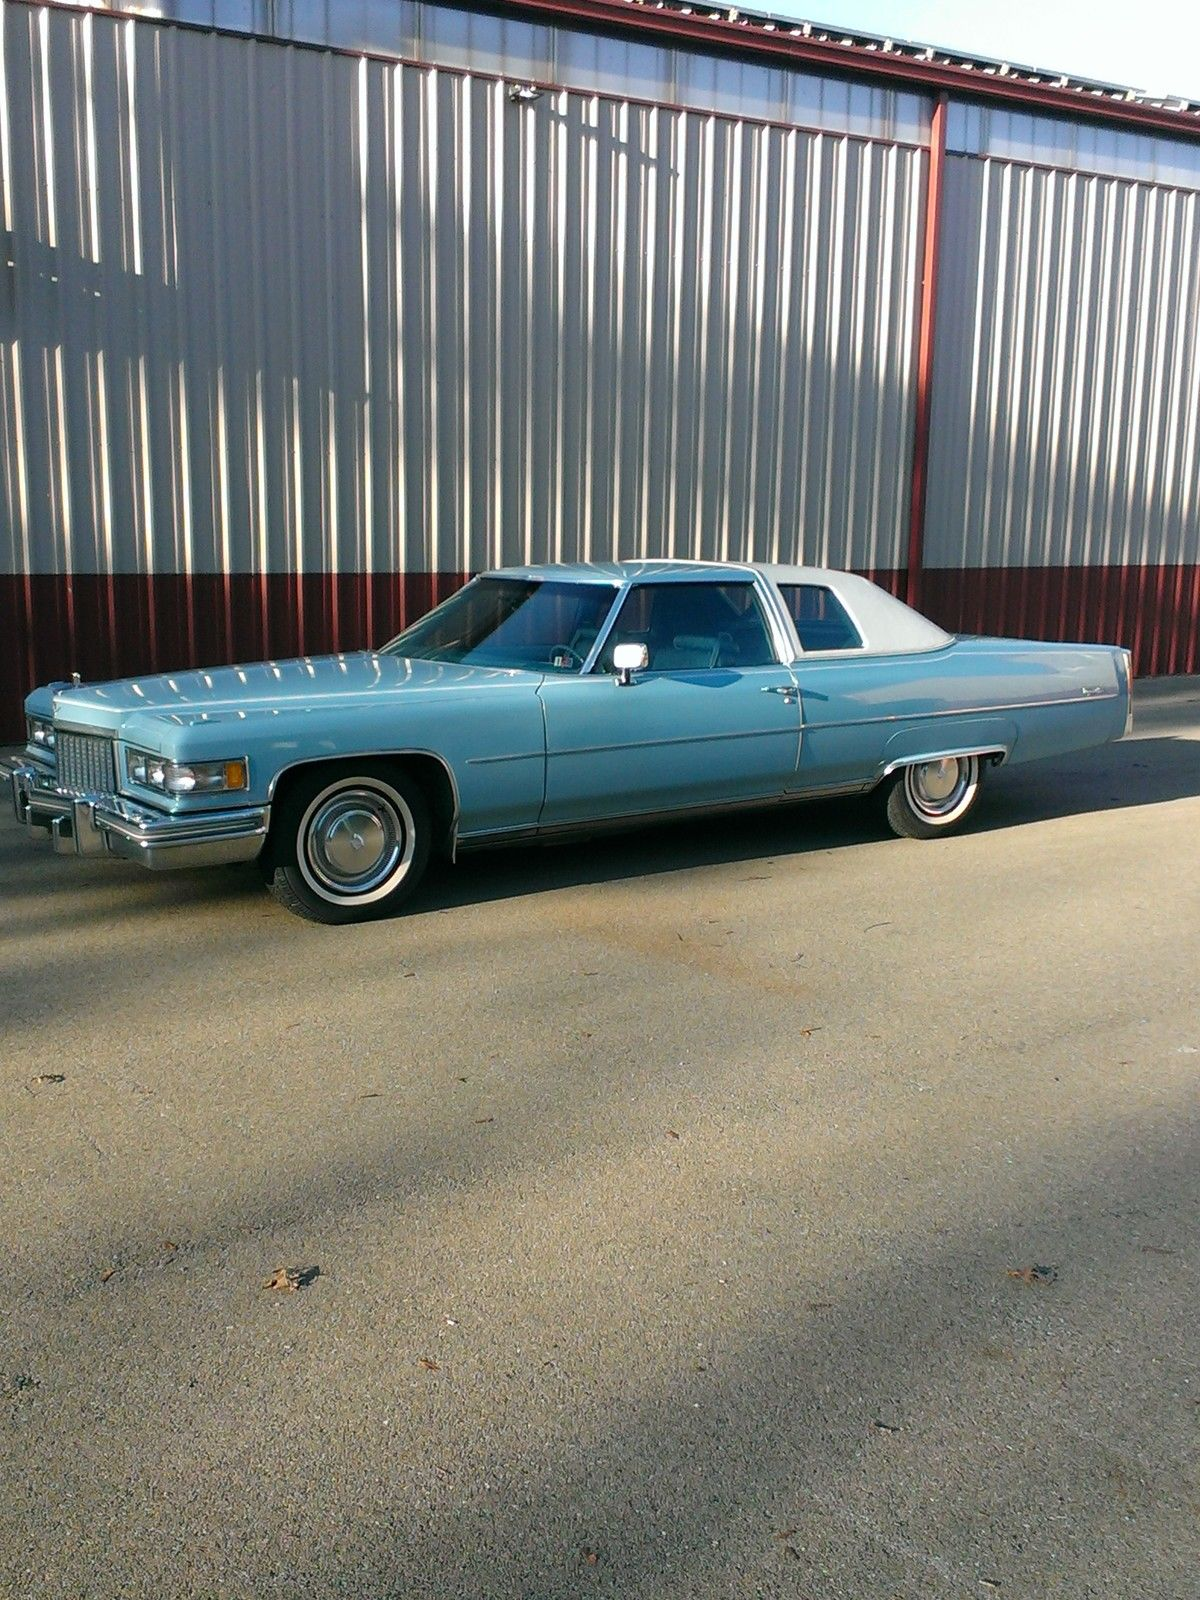 1975 Cadillac Coupe Deville Estate Car Classic Cadillac